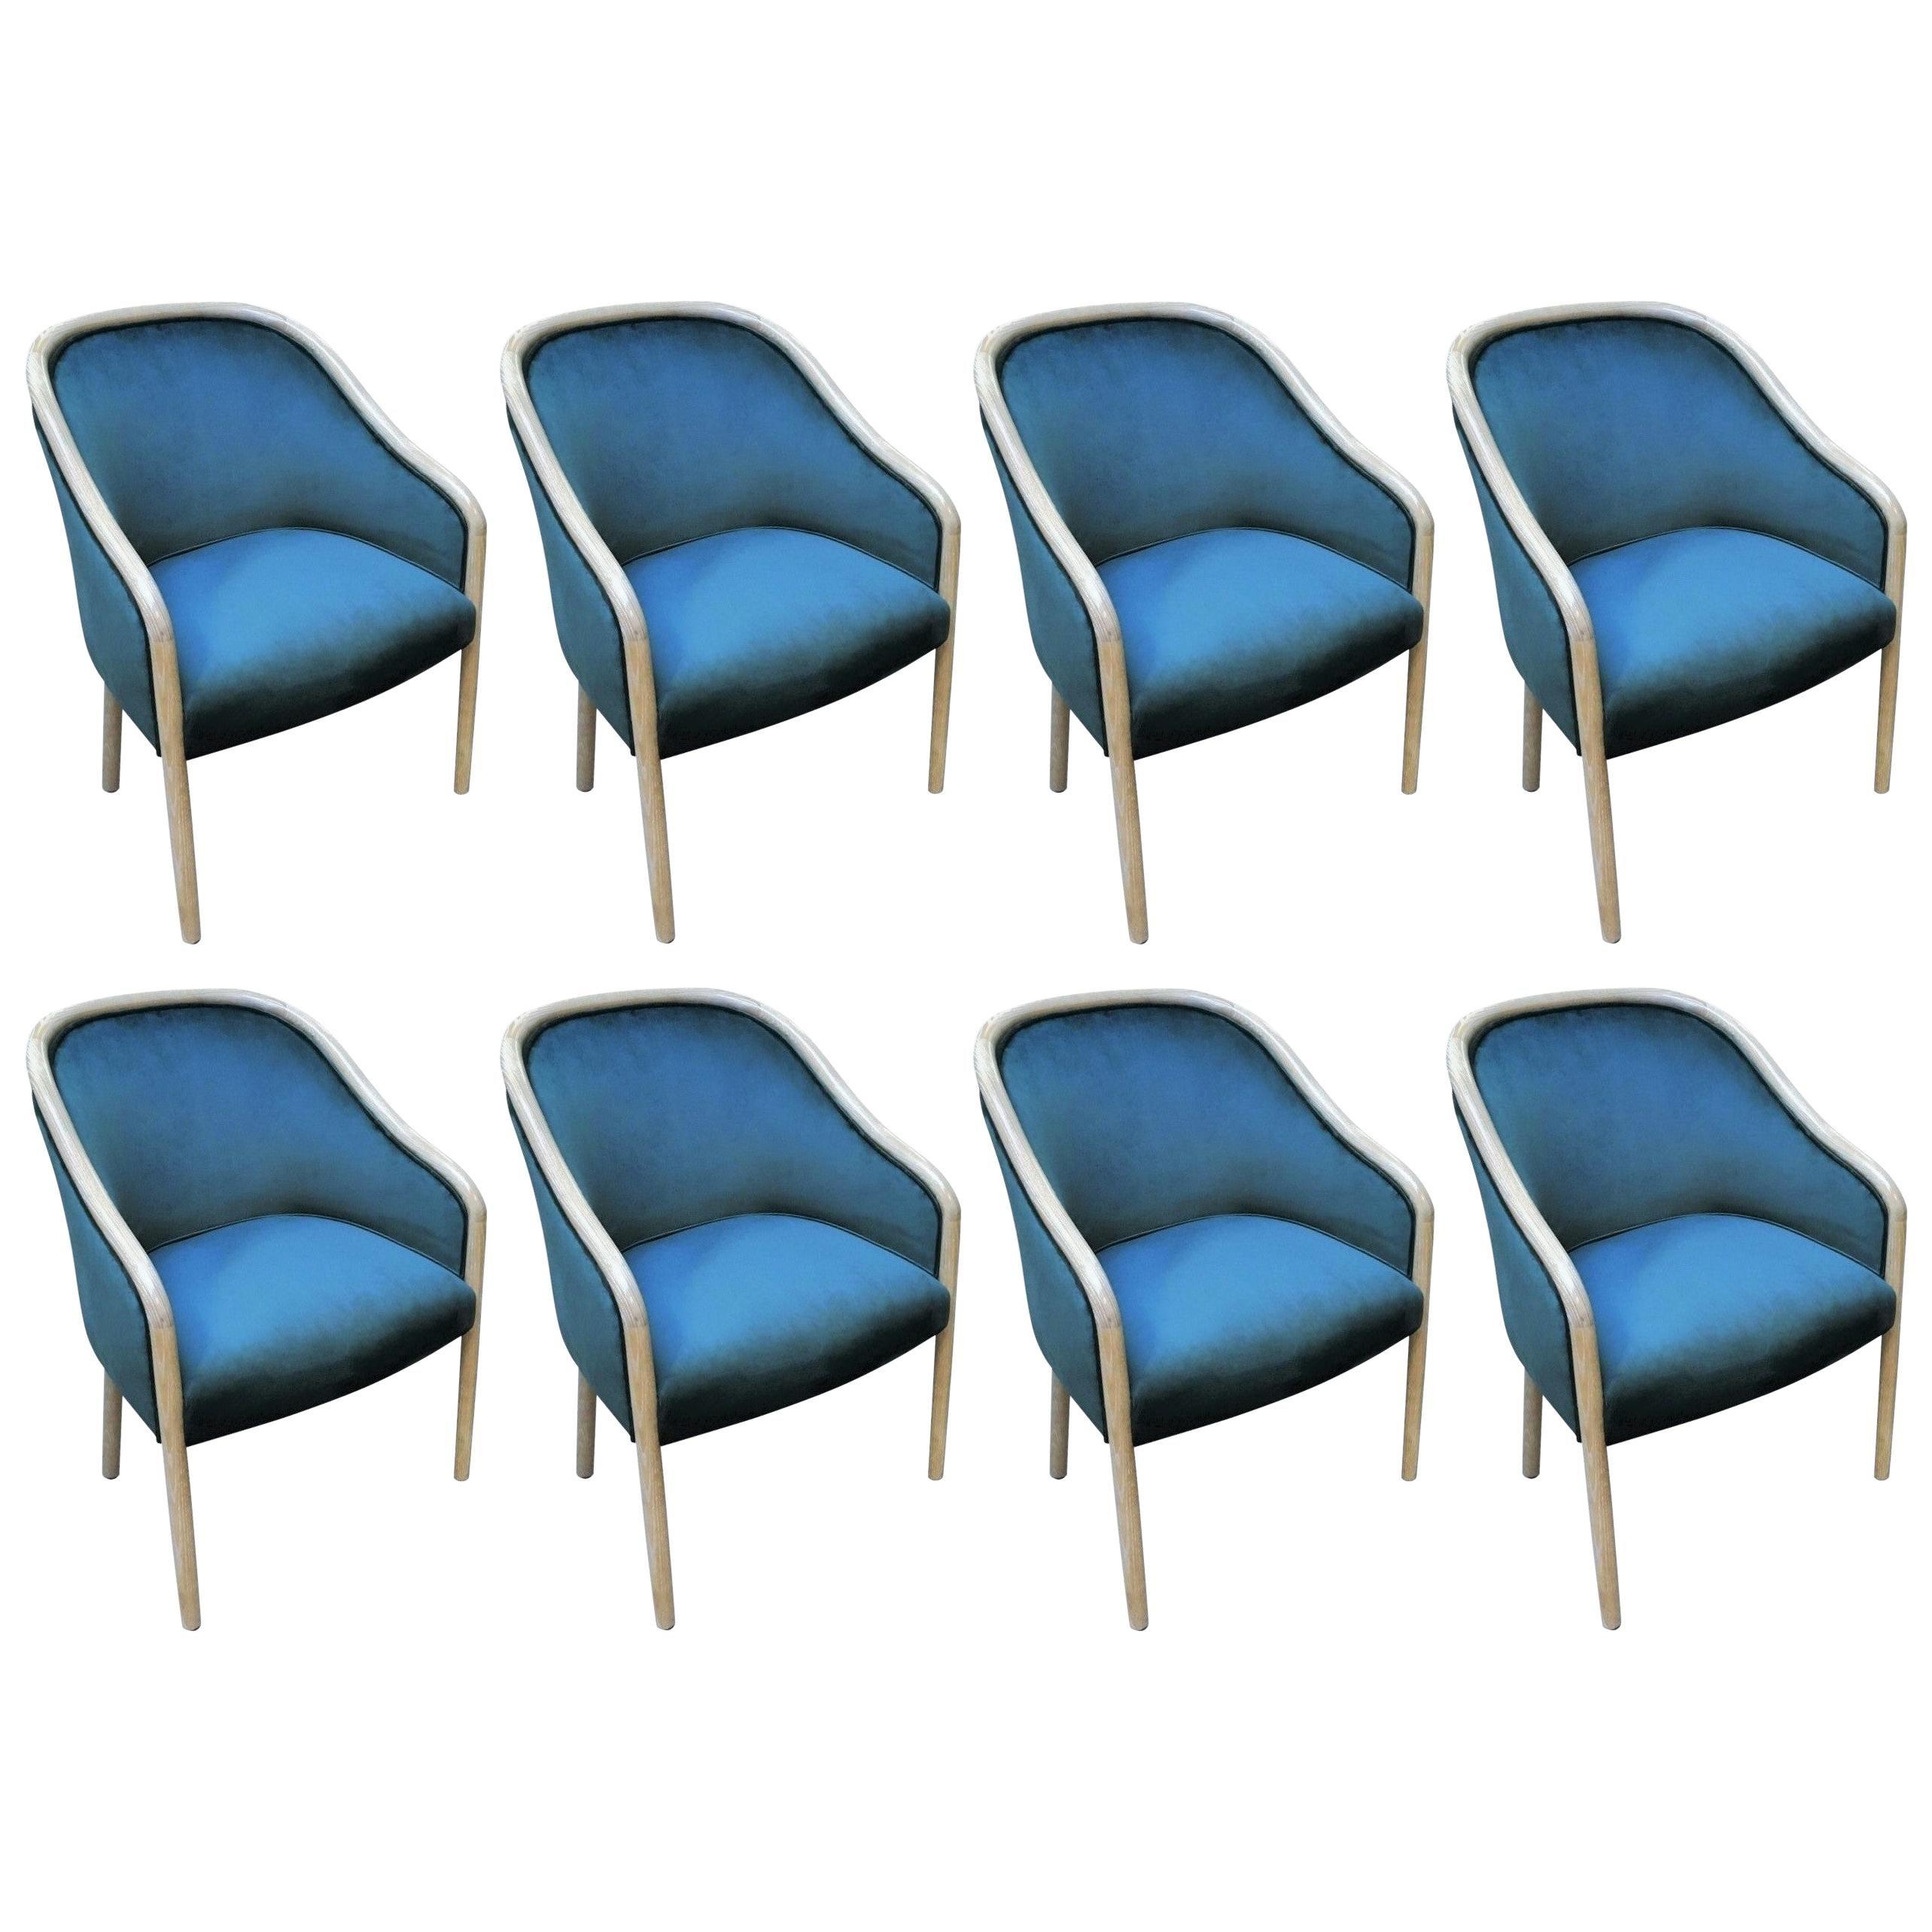 Set of Eight Ward Bennett for Brickell Associates Armchairs in Blue